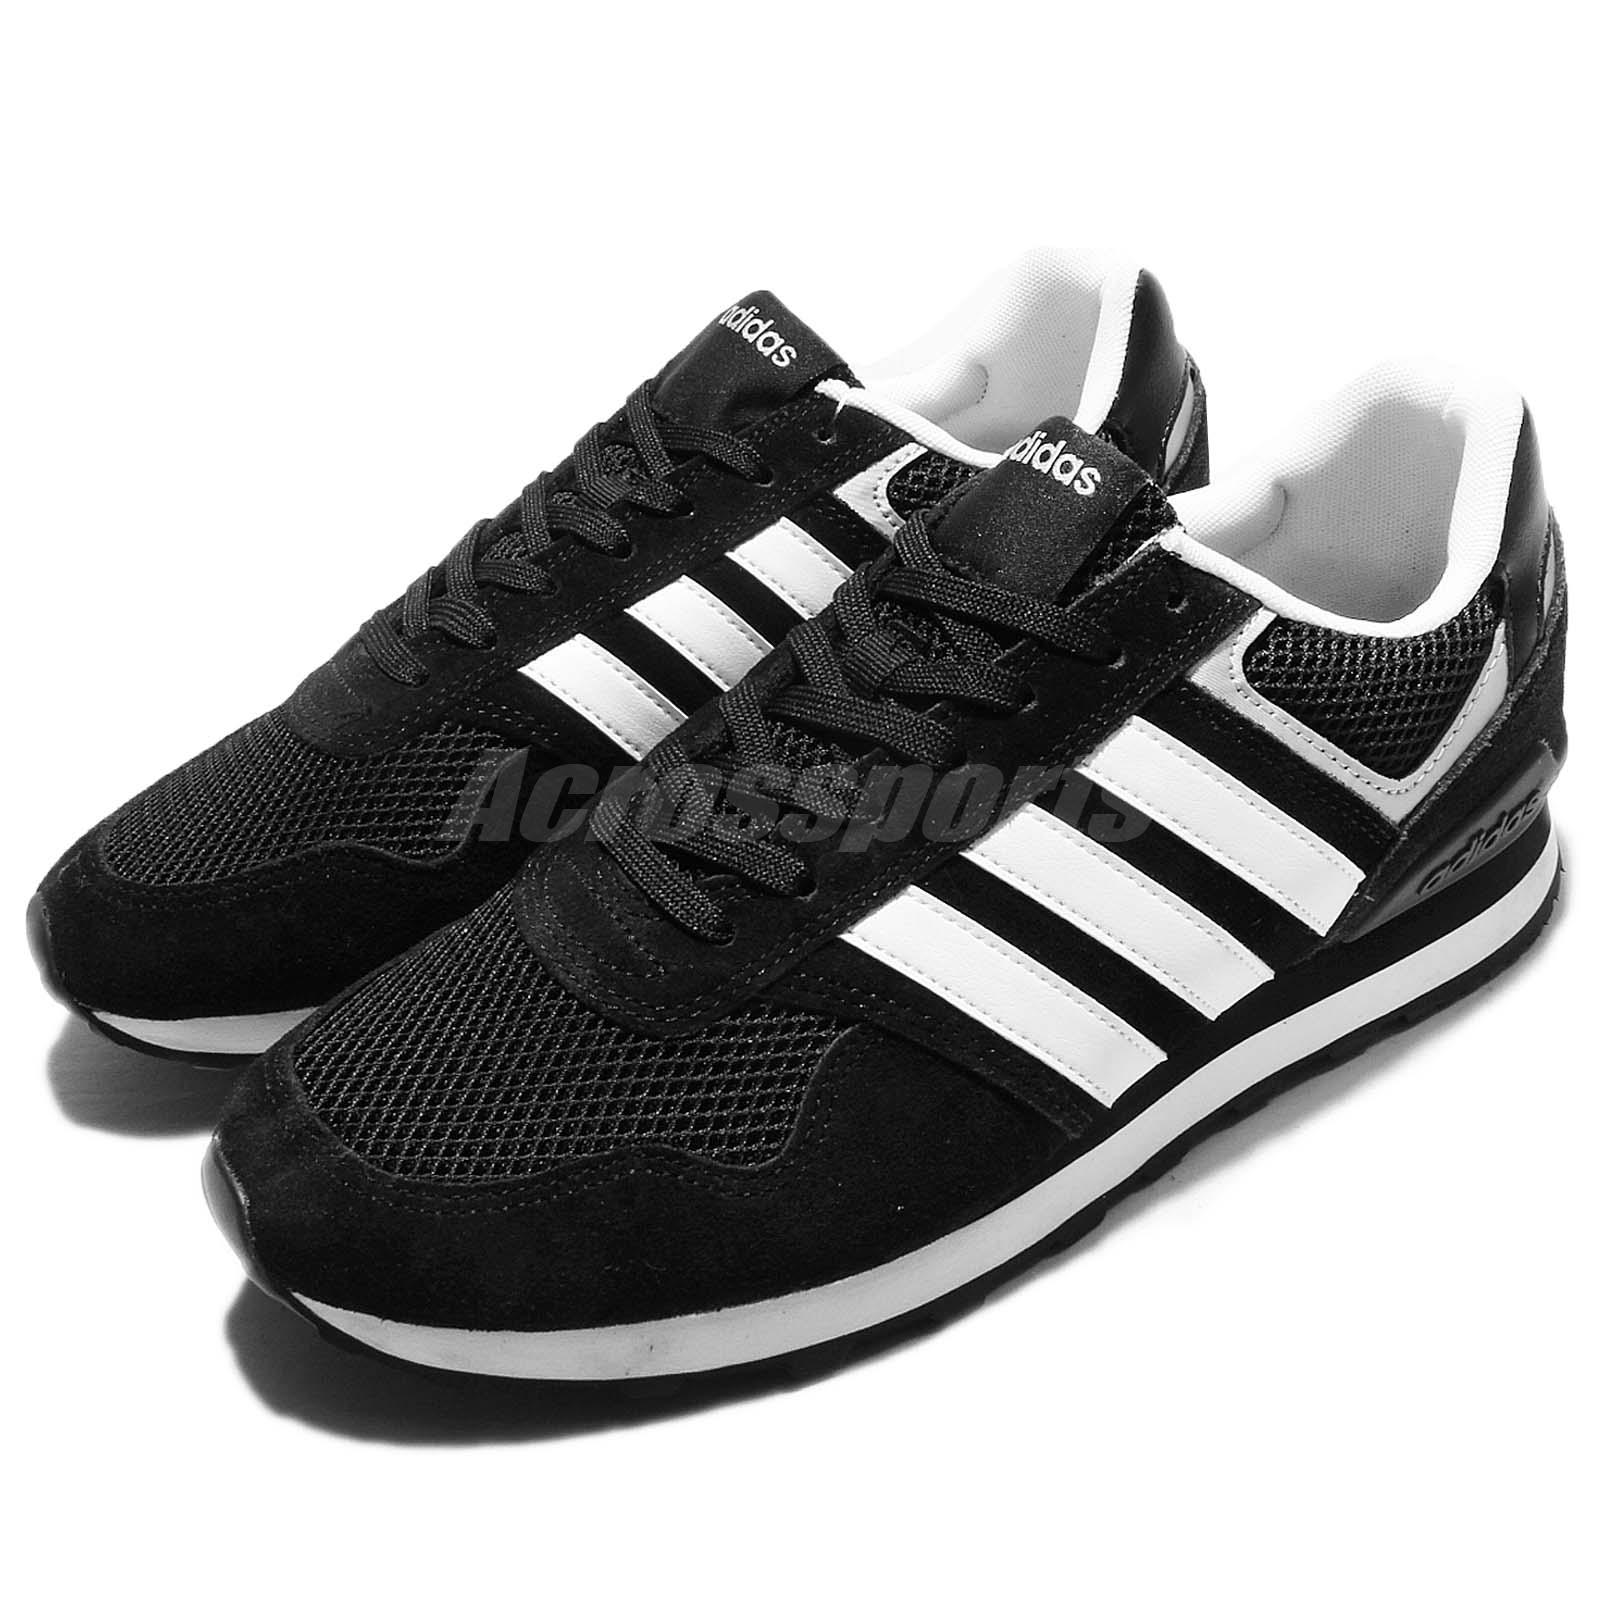 adidas neo label 10k black white suede mens casual shoes. Black Bedroom Furniture Sets. Home Design Ideas